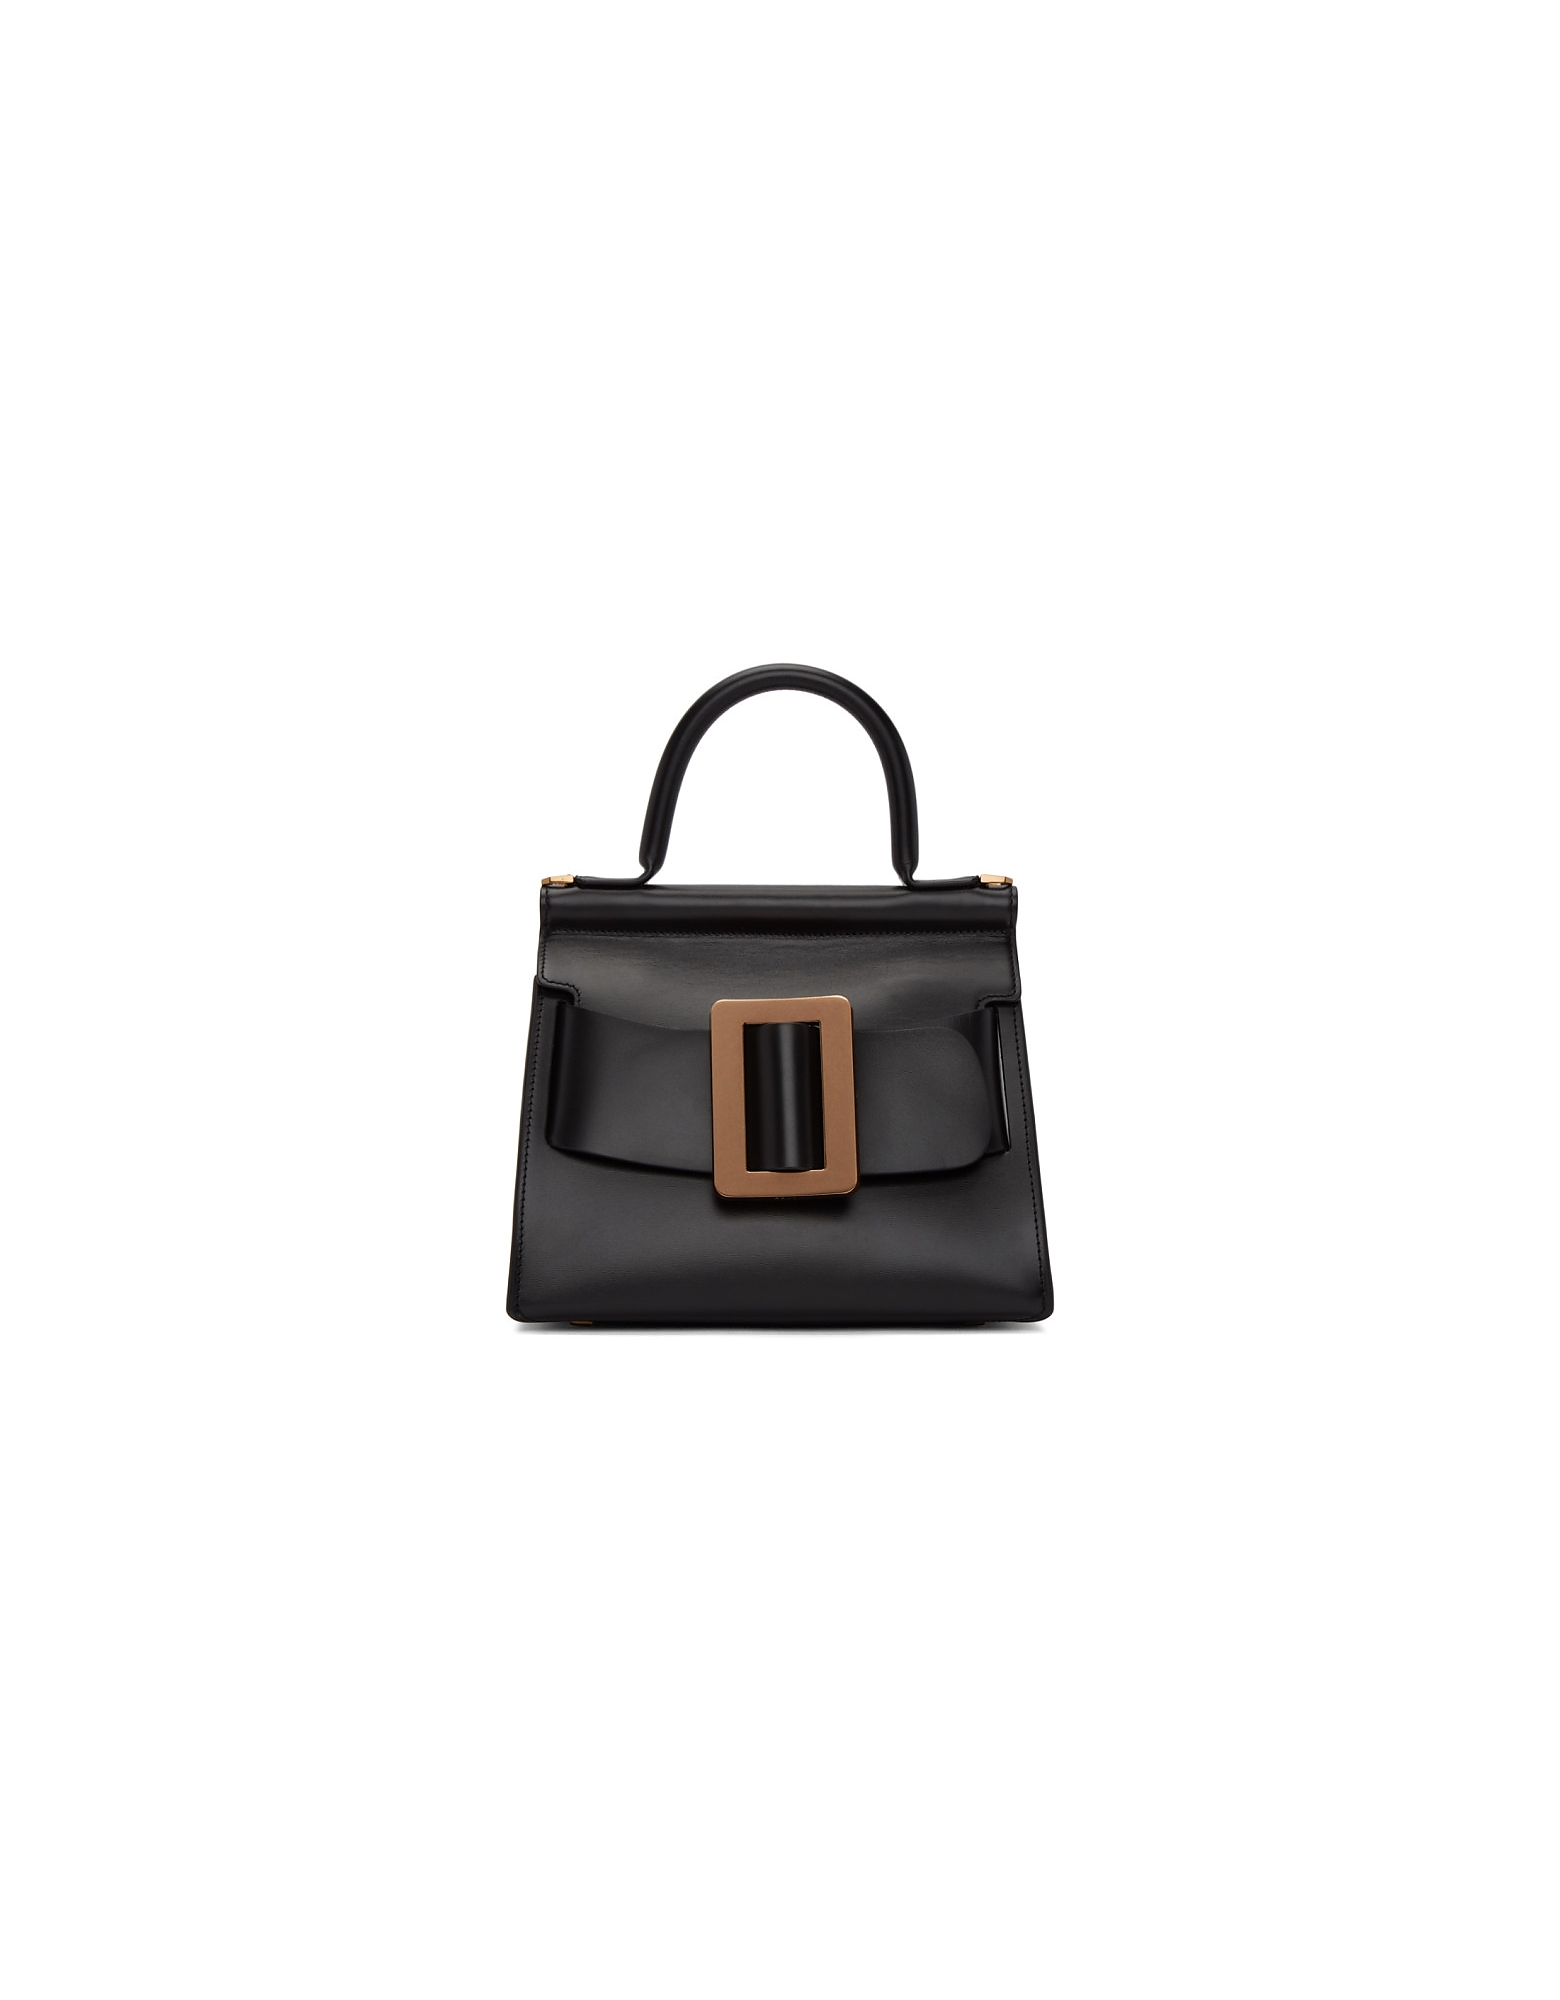 BOYY Designer Handbags, Black Karl 24 Top Handle Bag